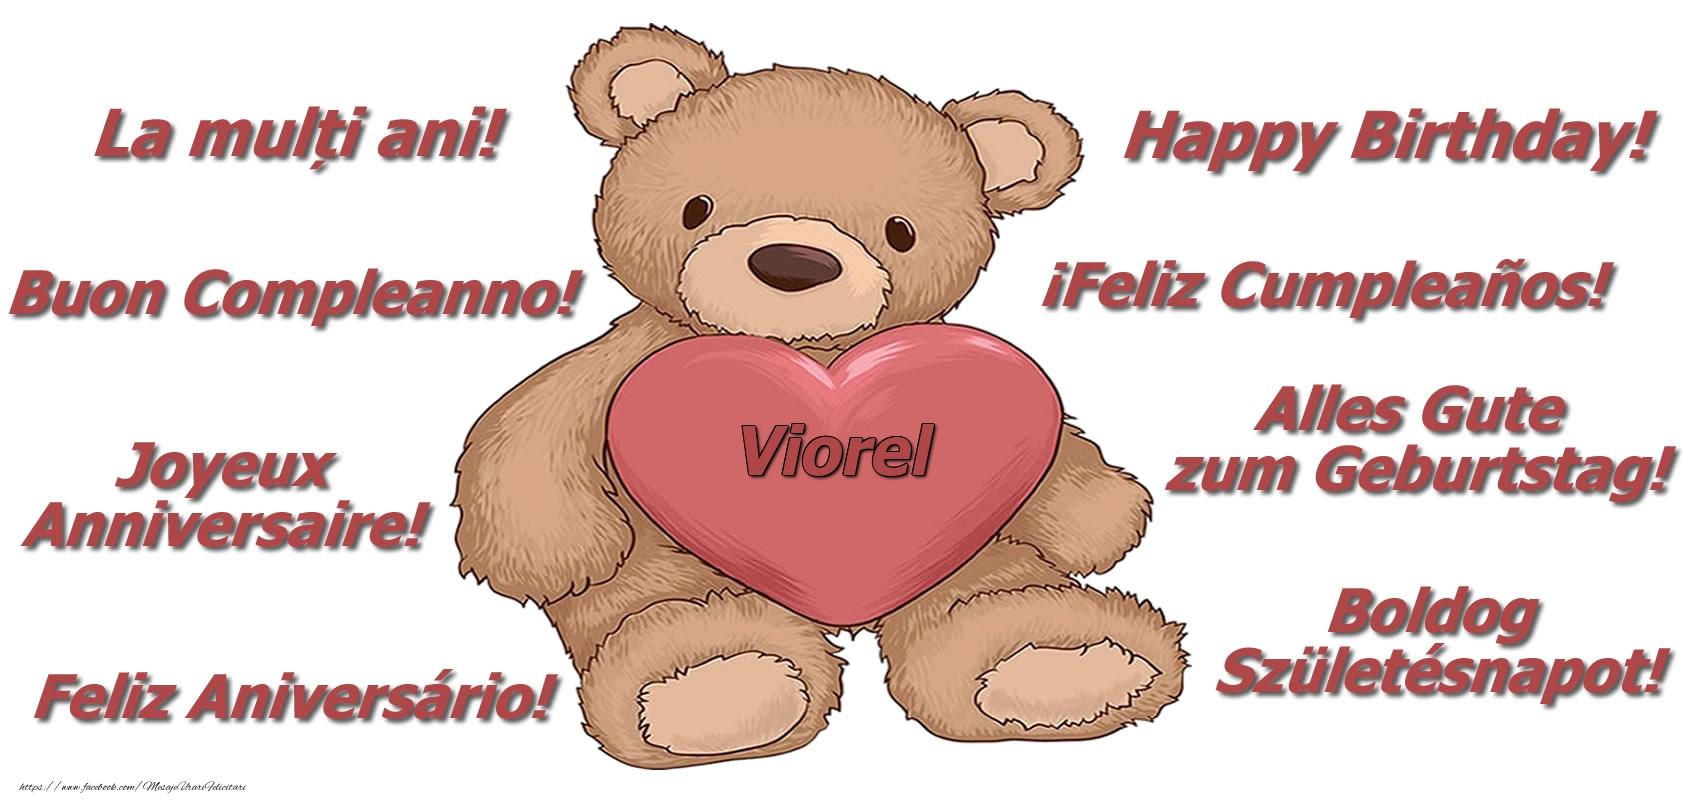 Felicitari de zi de nastere - La multi ani Viorel! - Ursulet